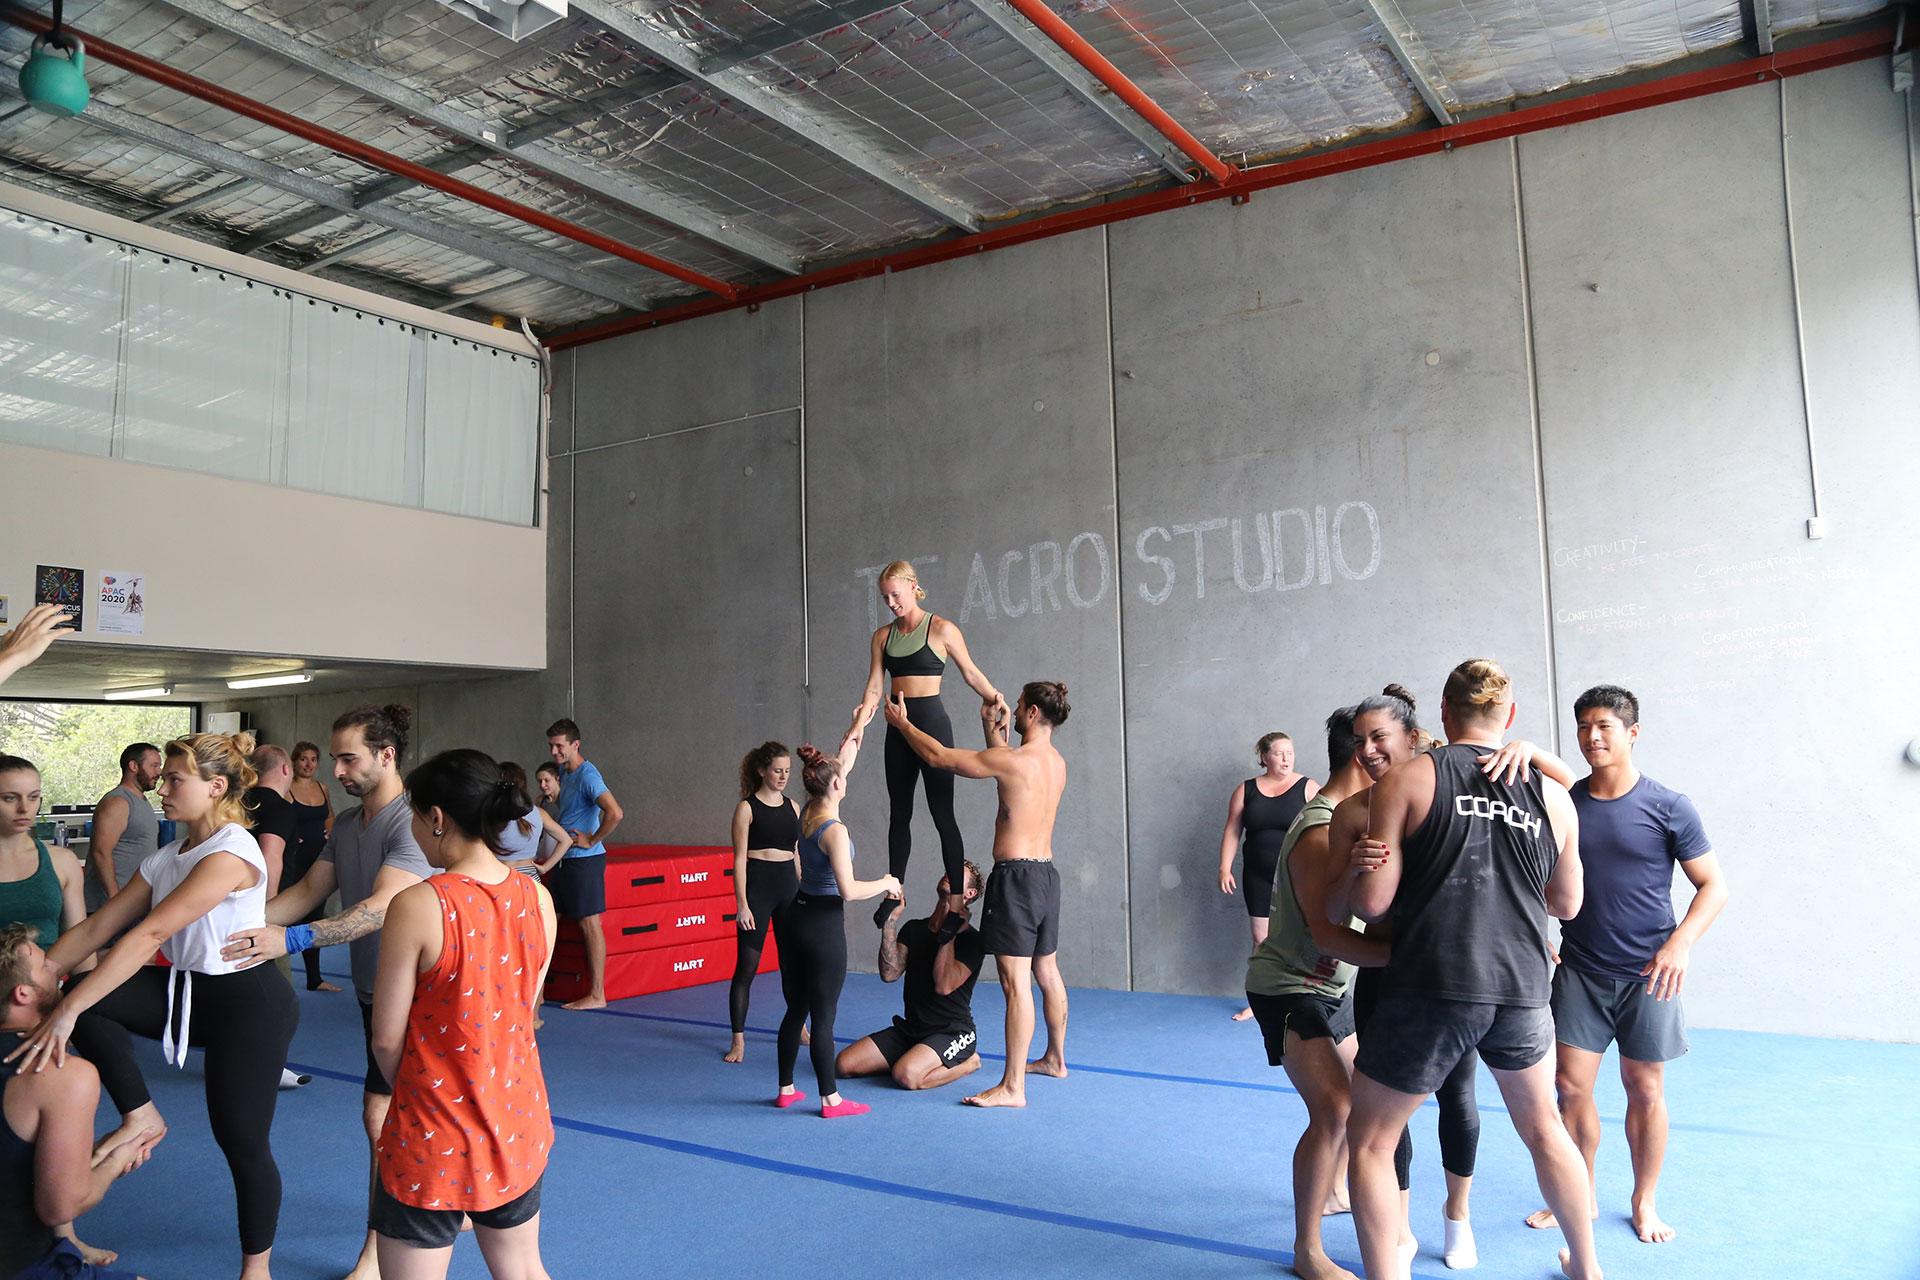 Teenagers Learning Acrobatics